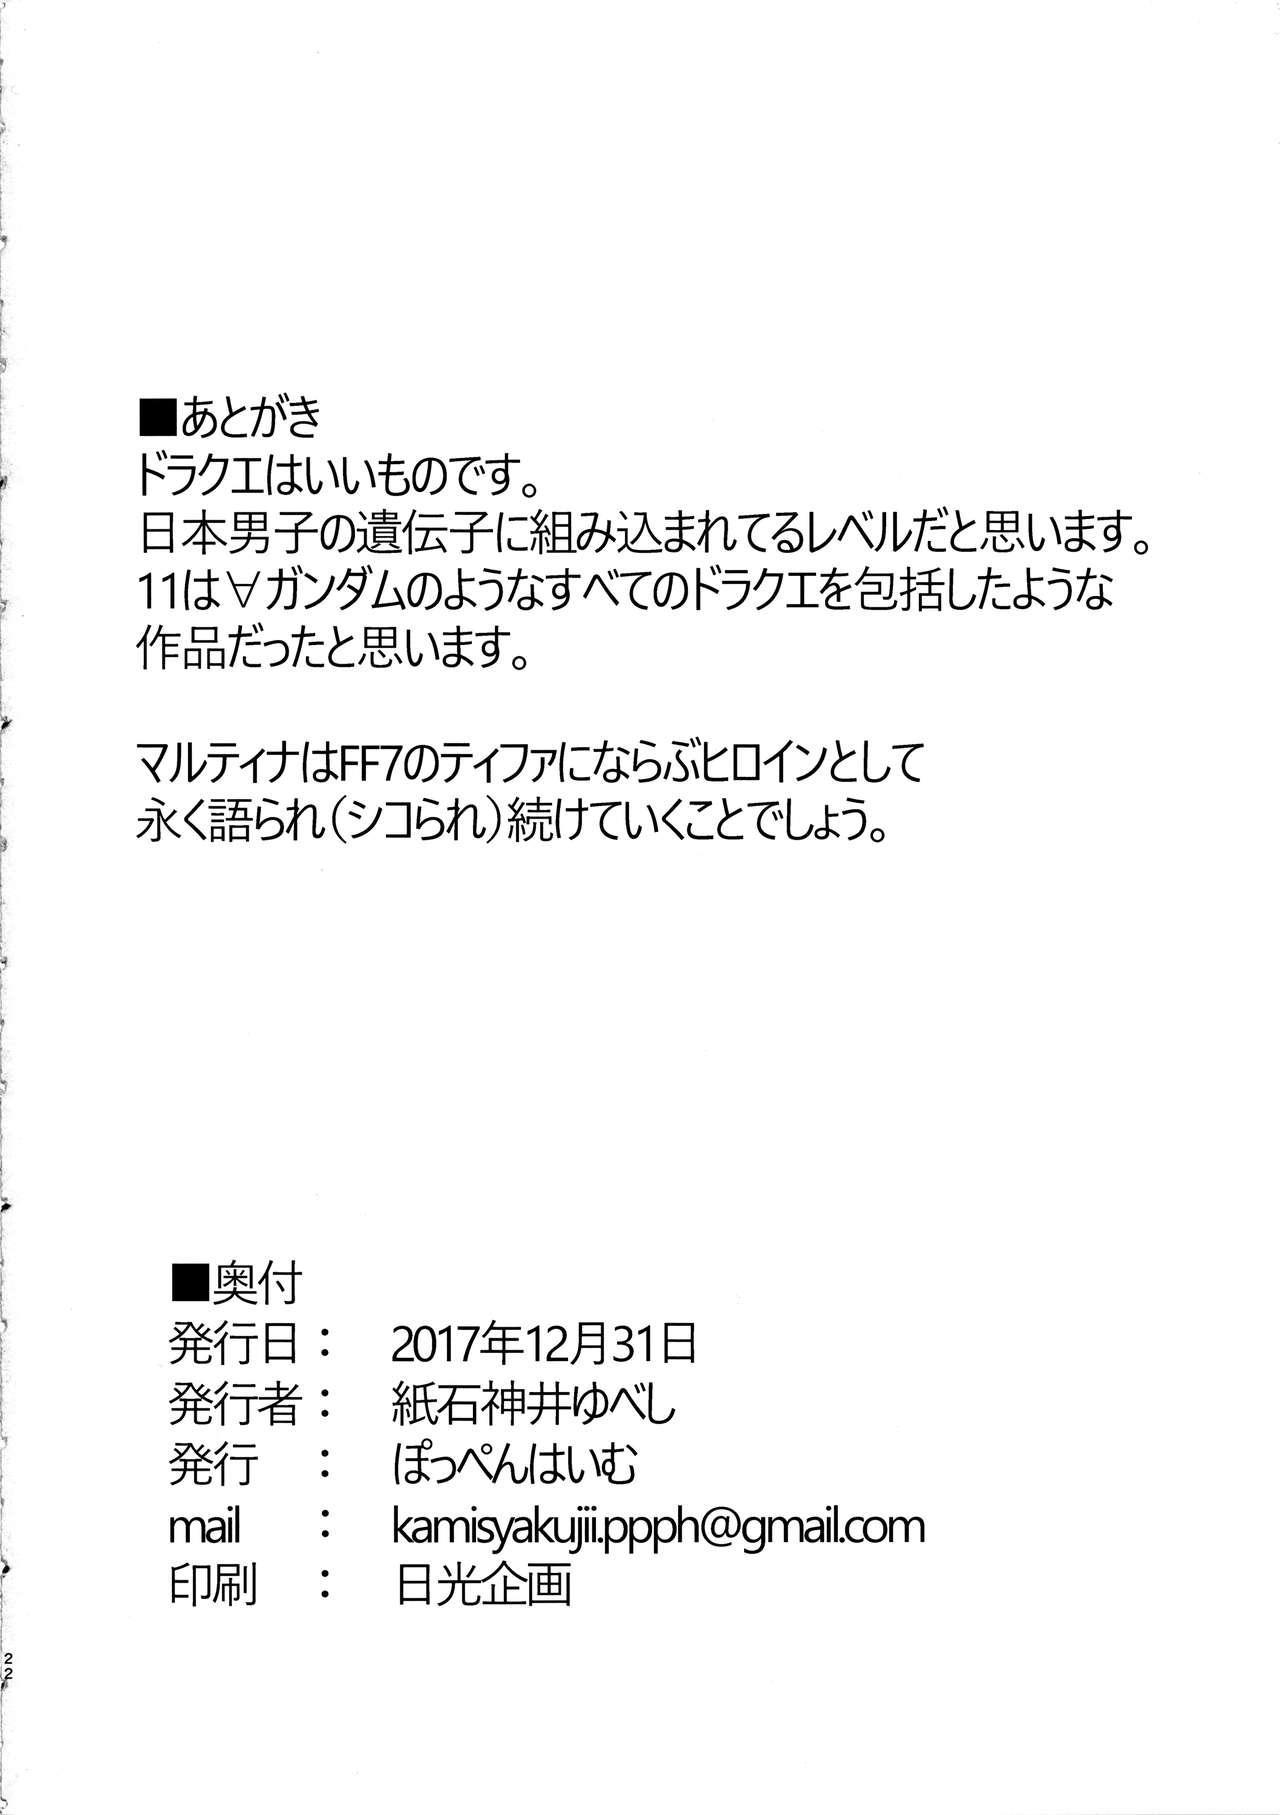 Hime-sama no Chiisana Medal Enkou 20